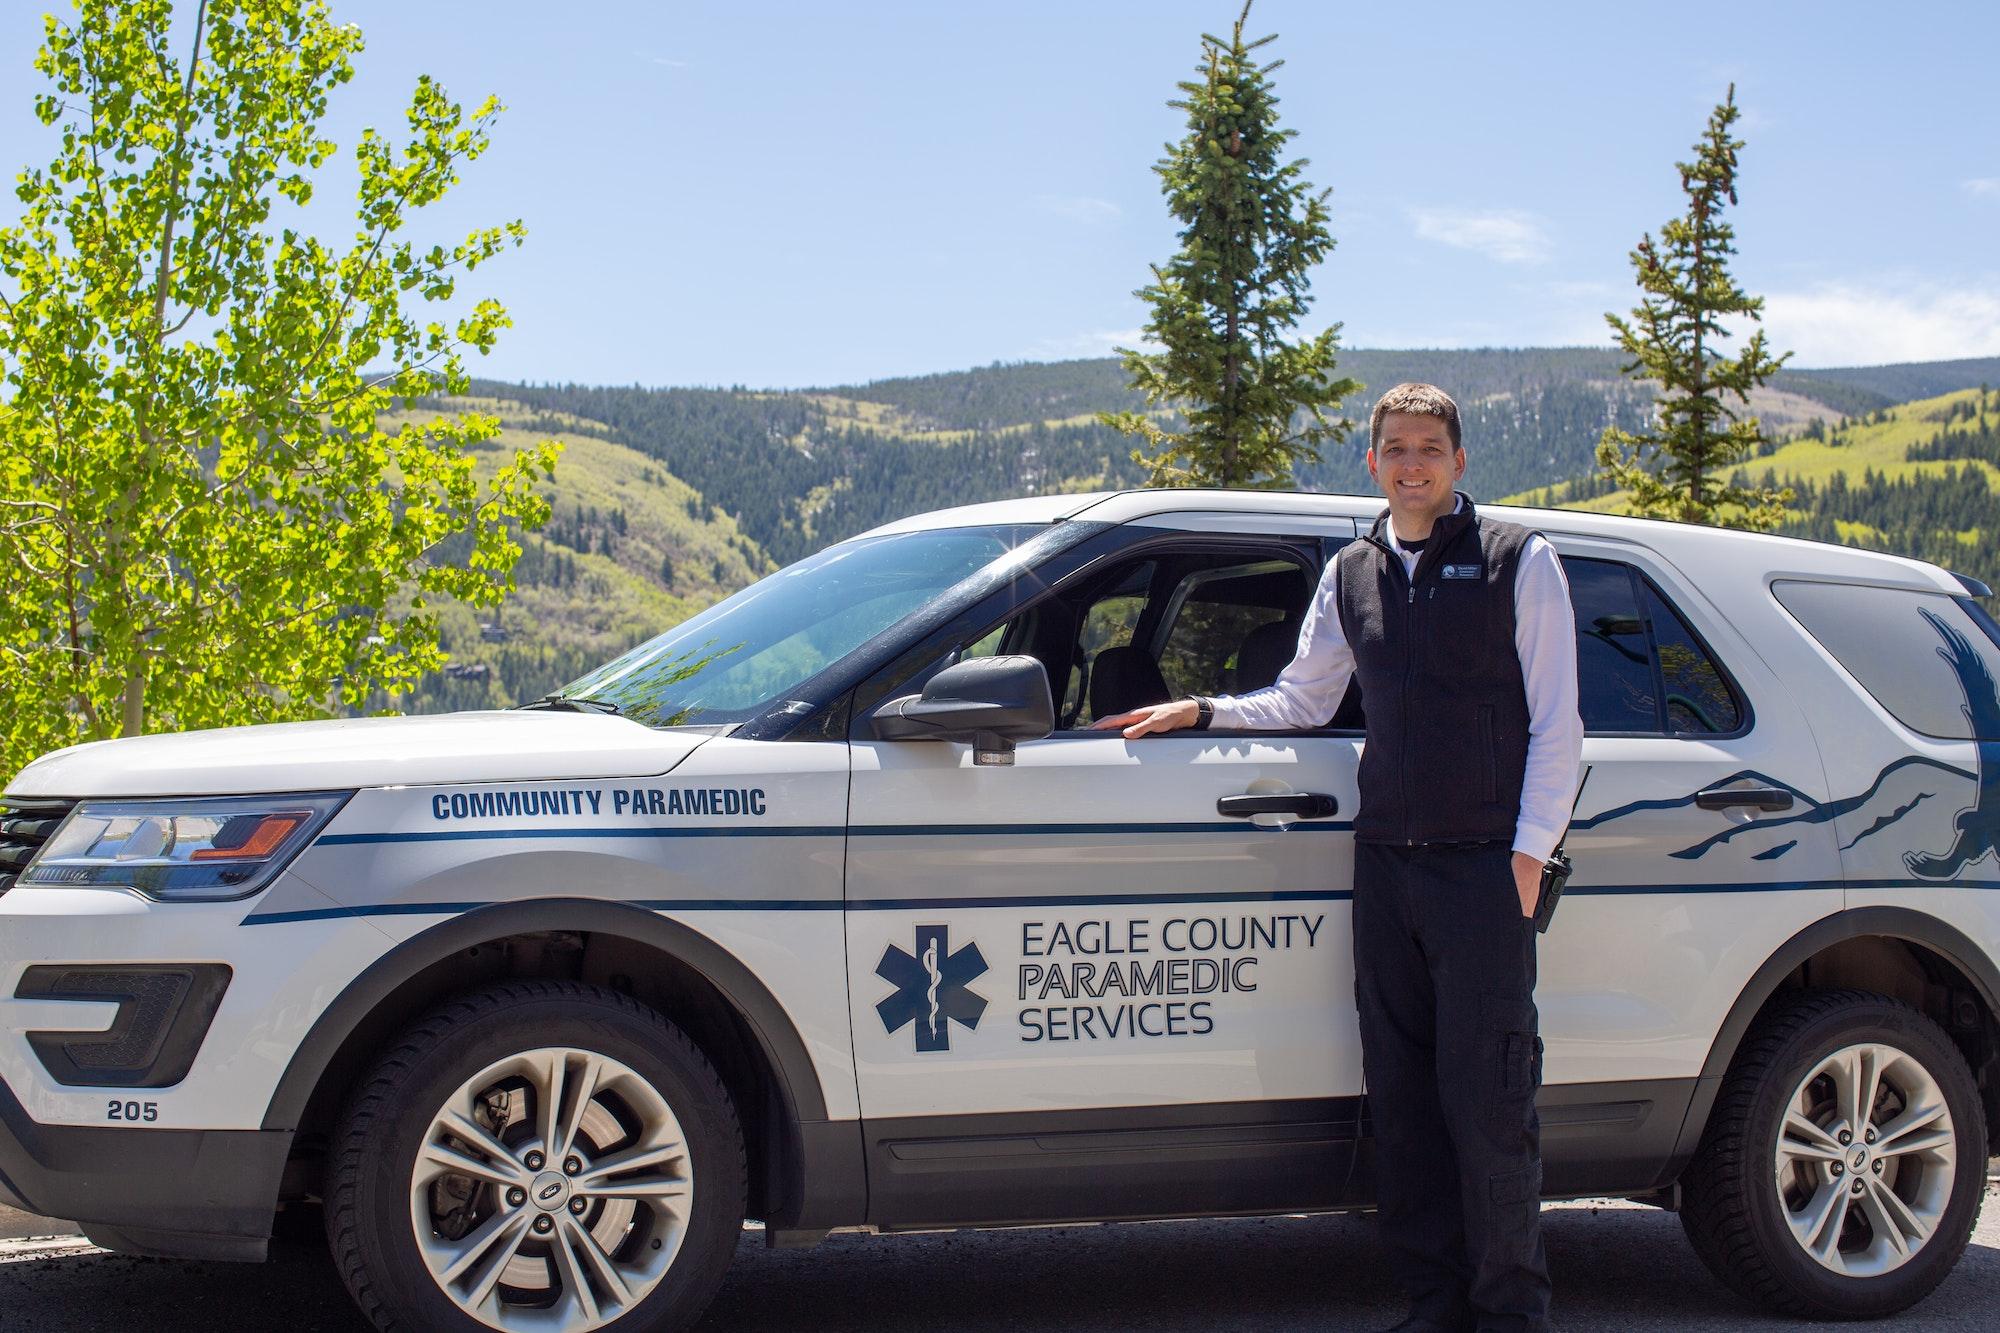 Community Paramedic David Miller standing in front of a community paramedic specific SUV